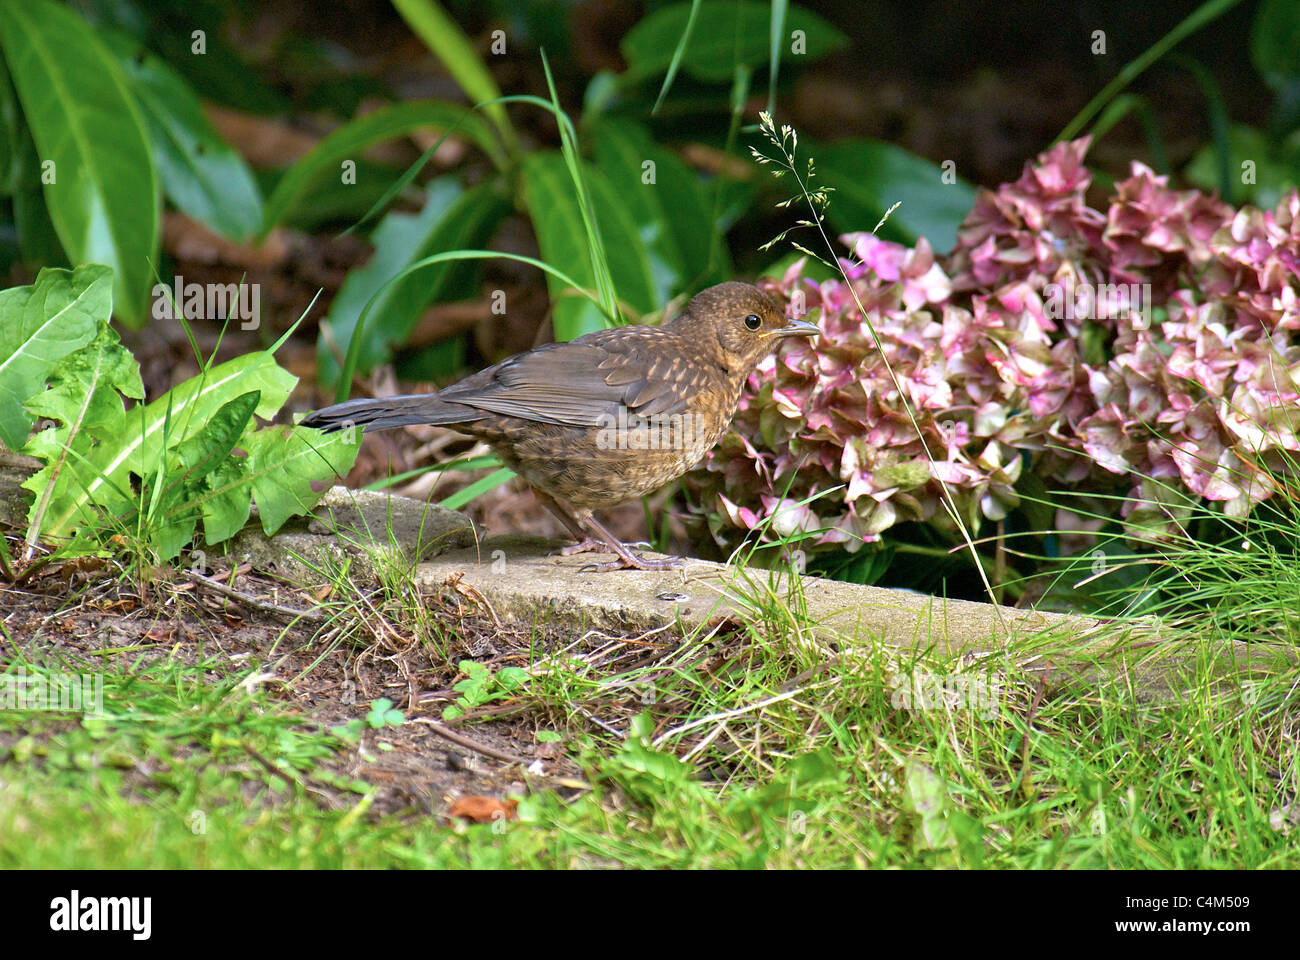 Fledgling Blackbird. - Stock Image